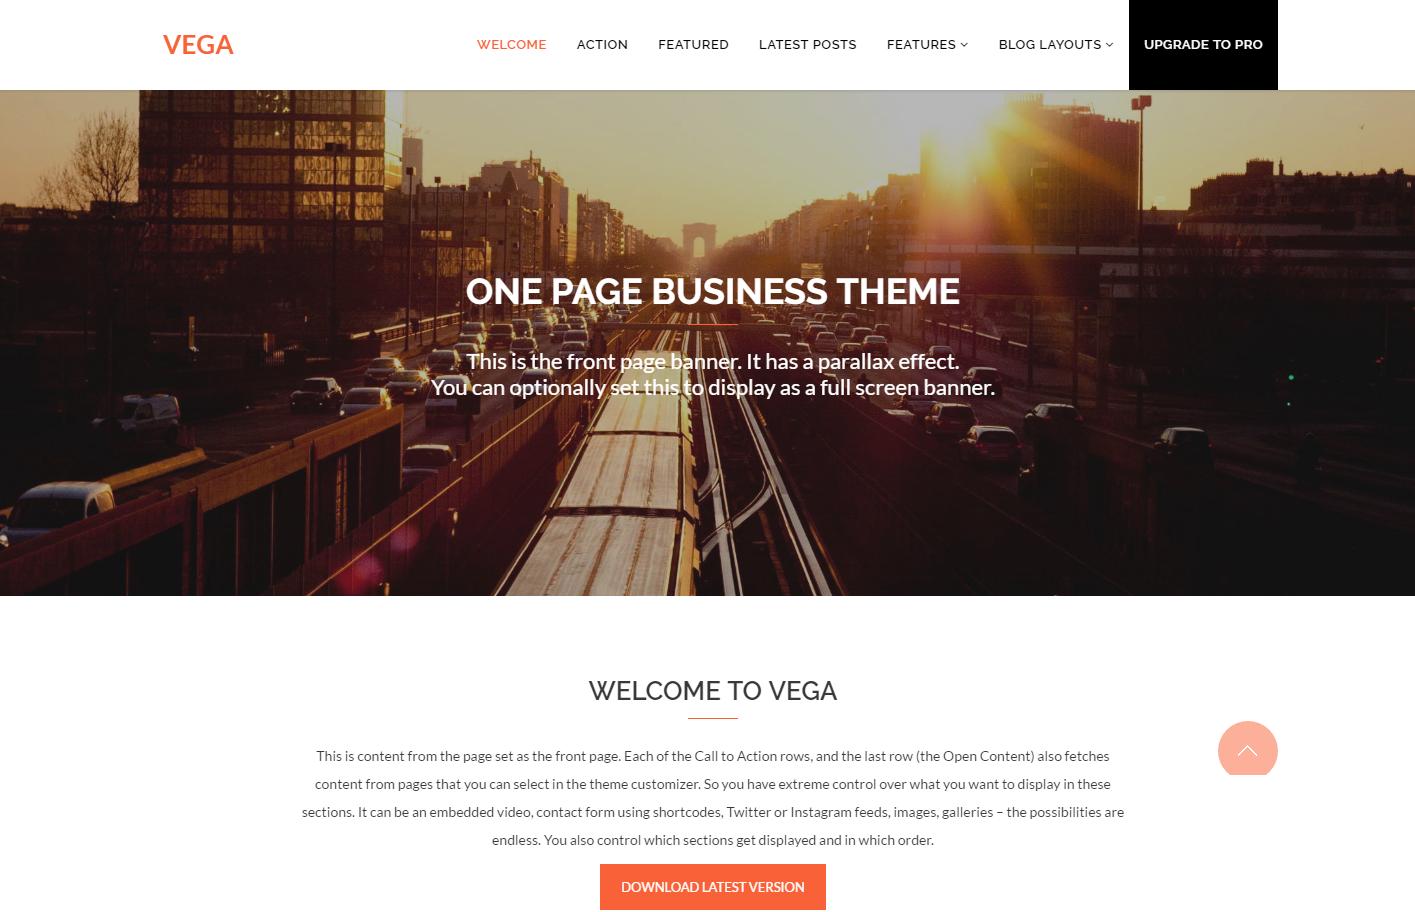 vega-free-wordpress-theme